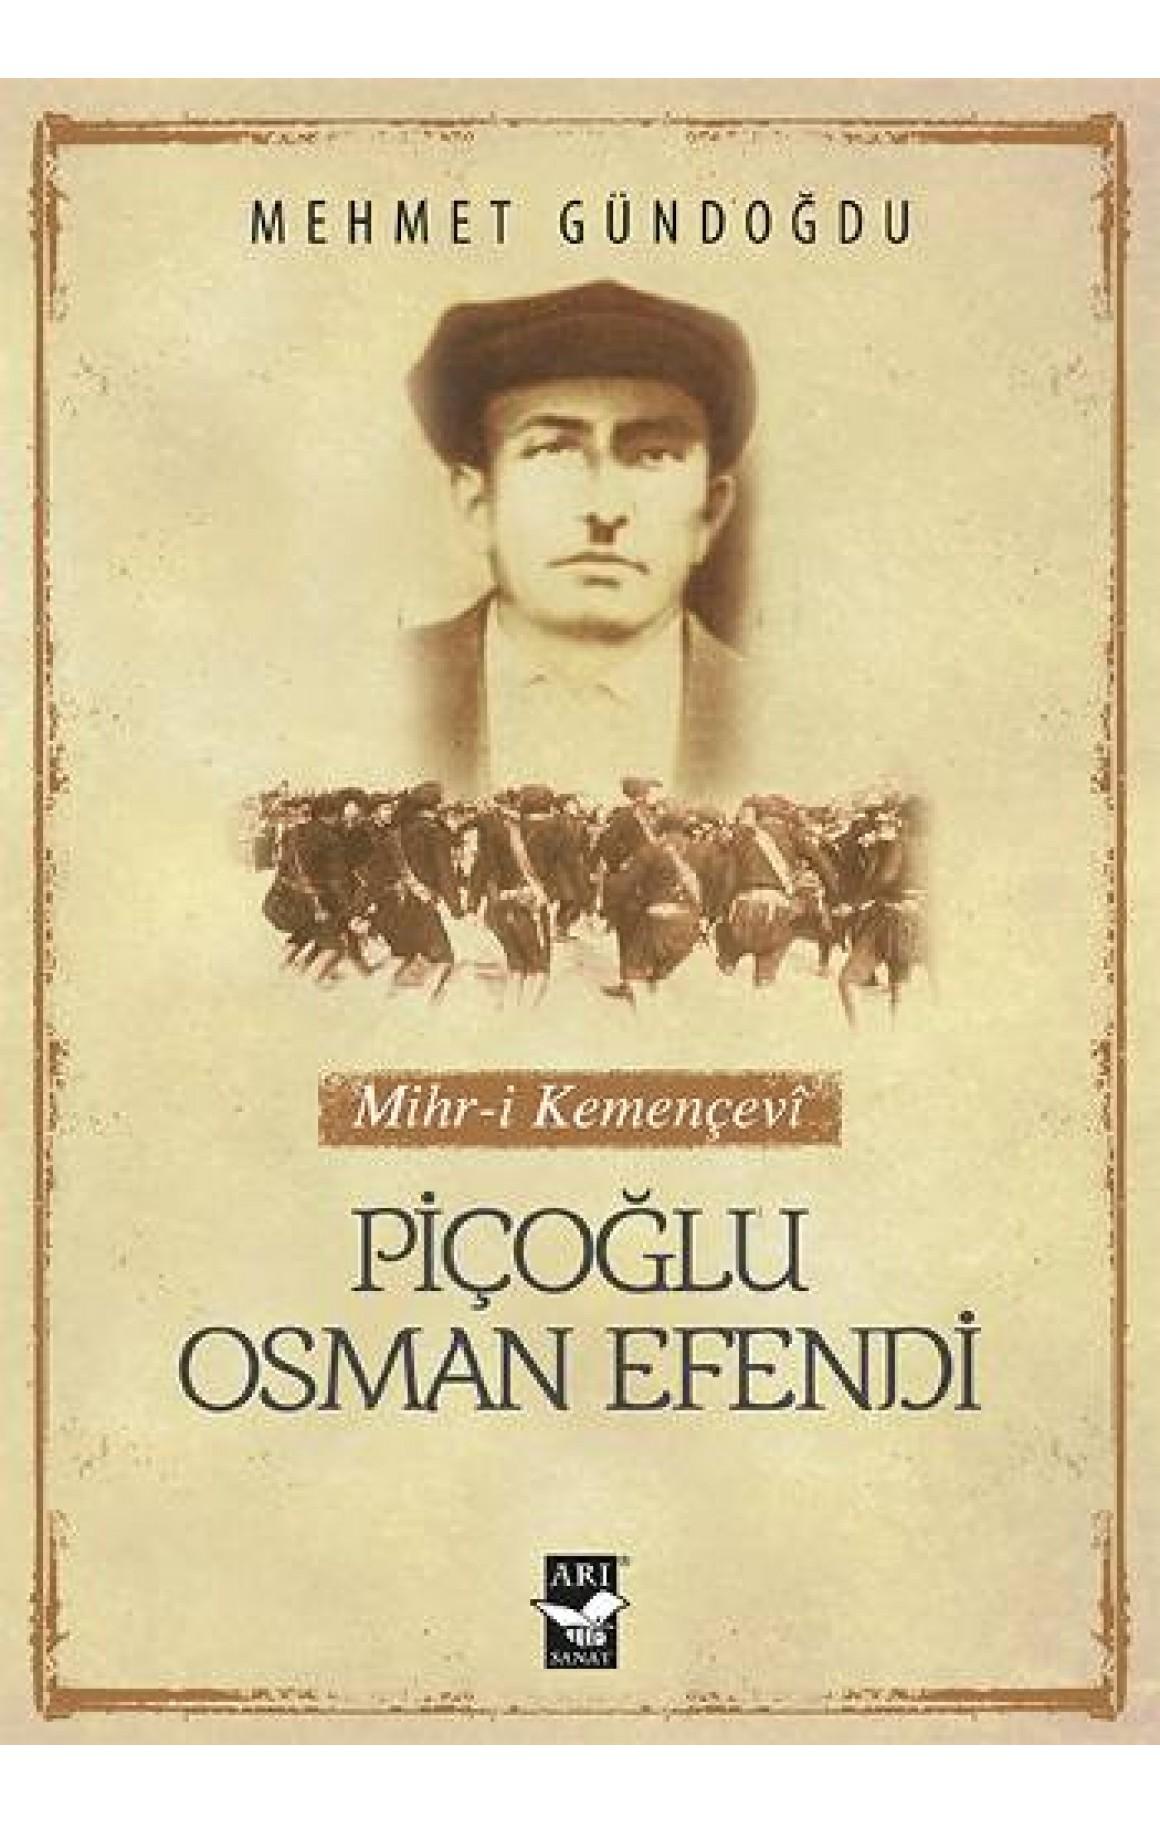 Piçoğlu Osman Efendi